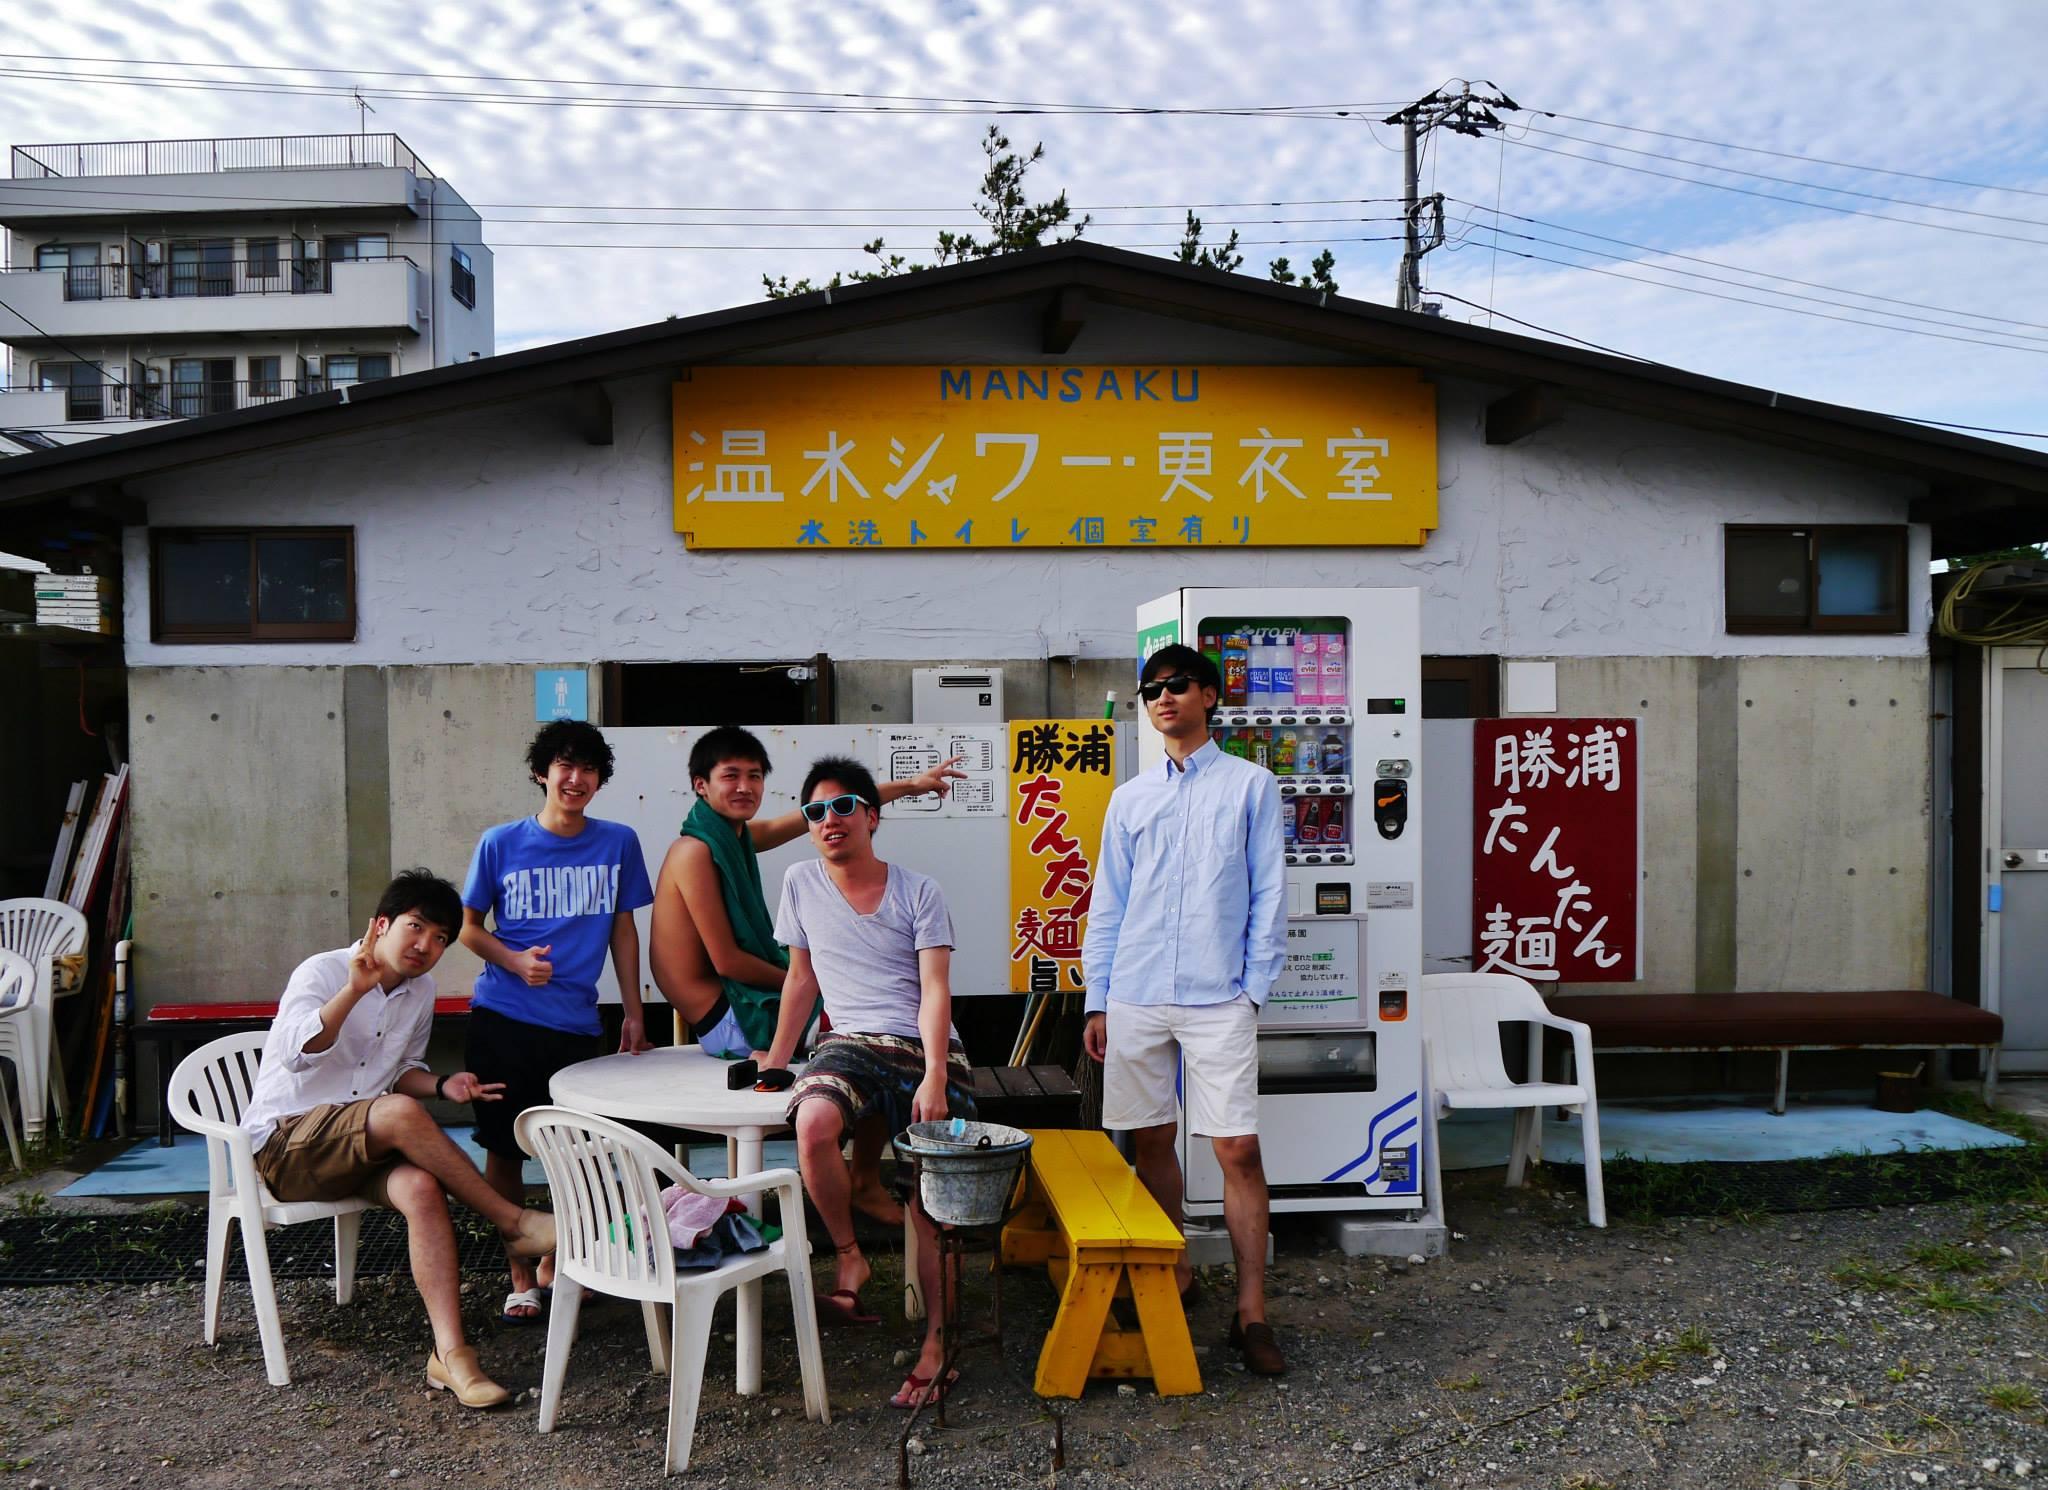 4.東京で就職時代